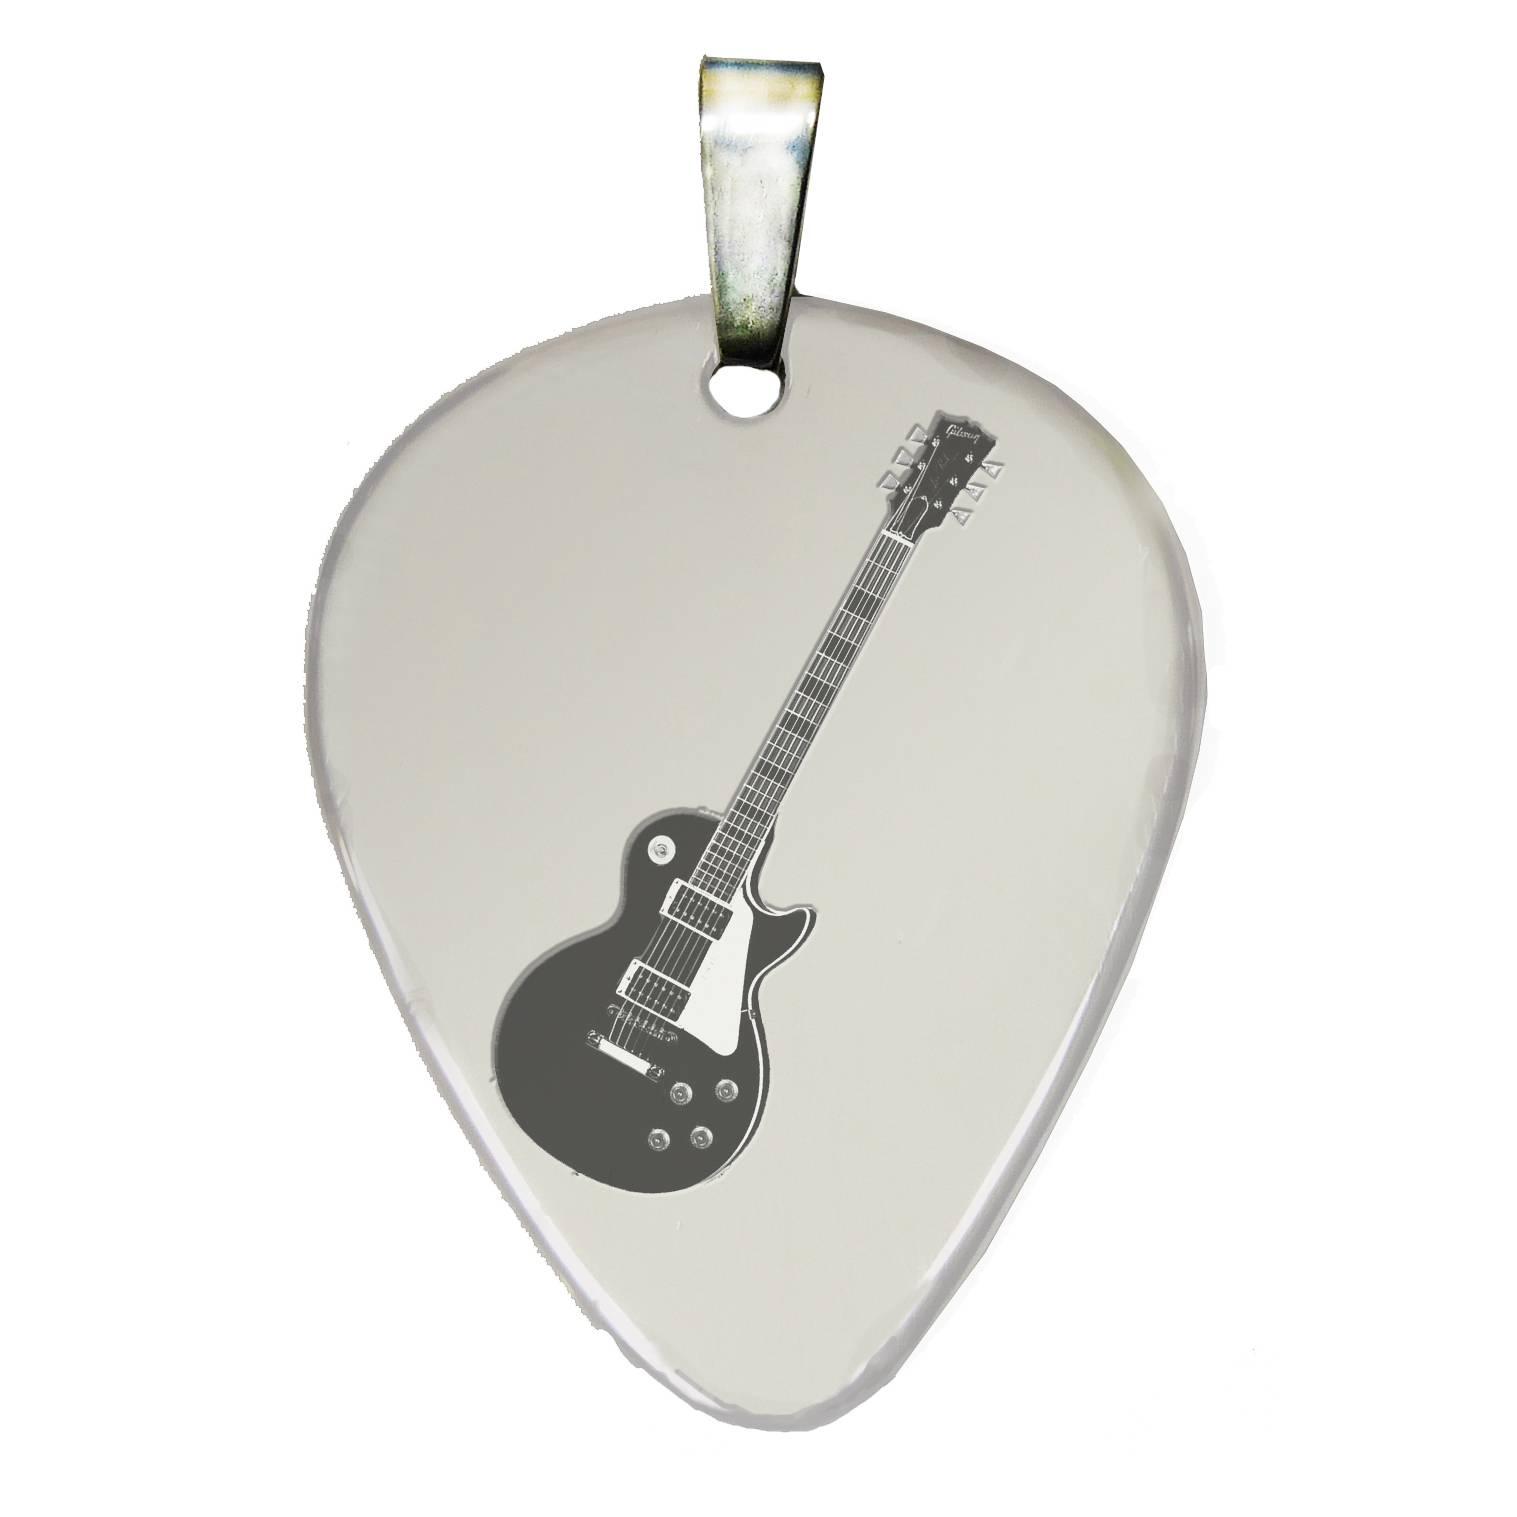 púa de guitarra con guitarra4